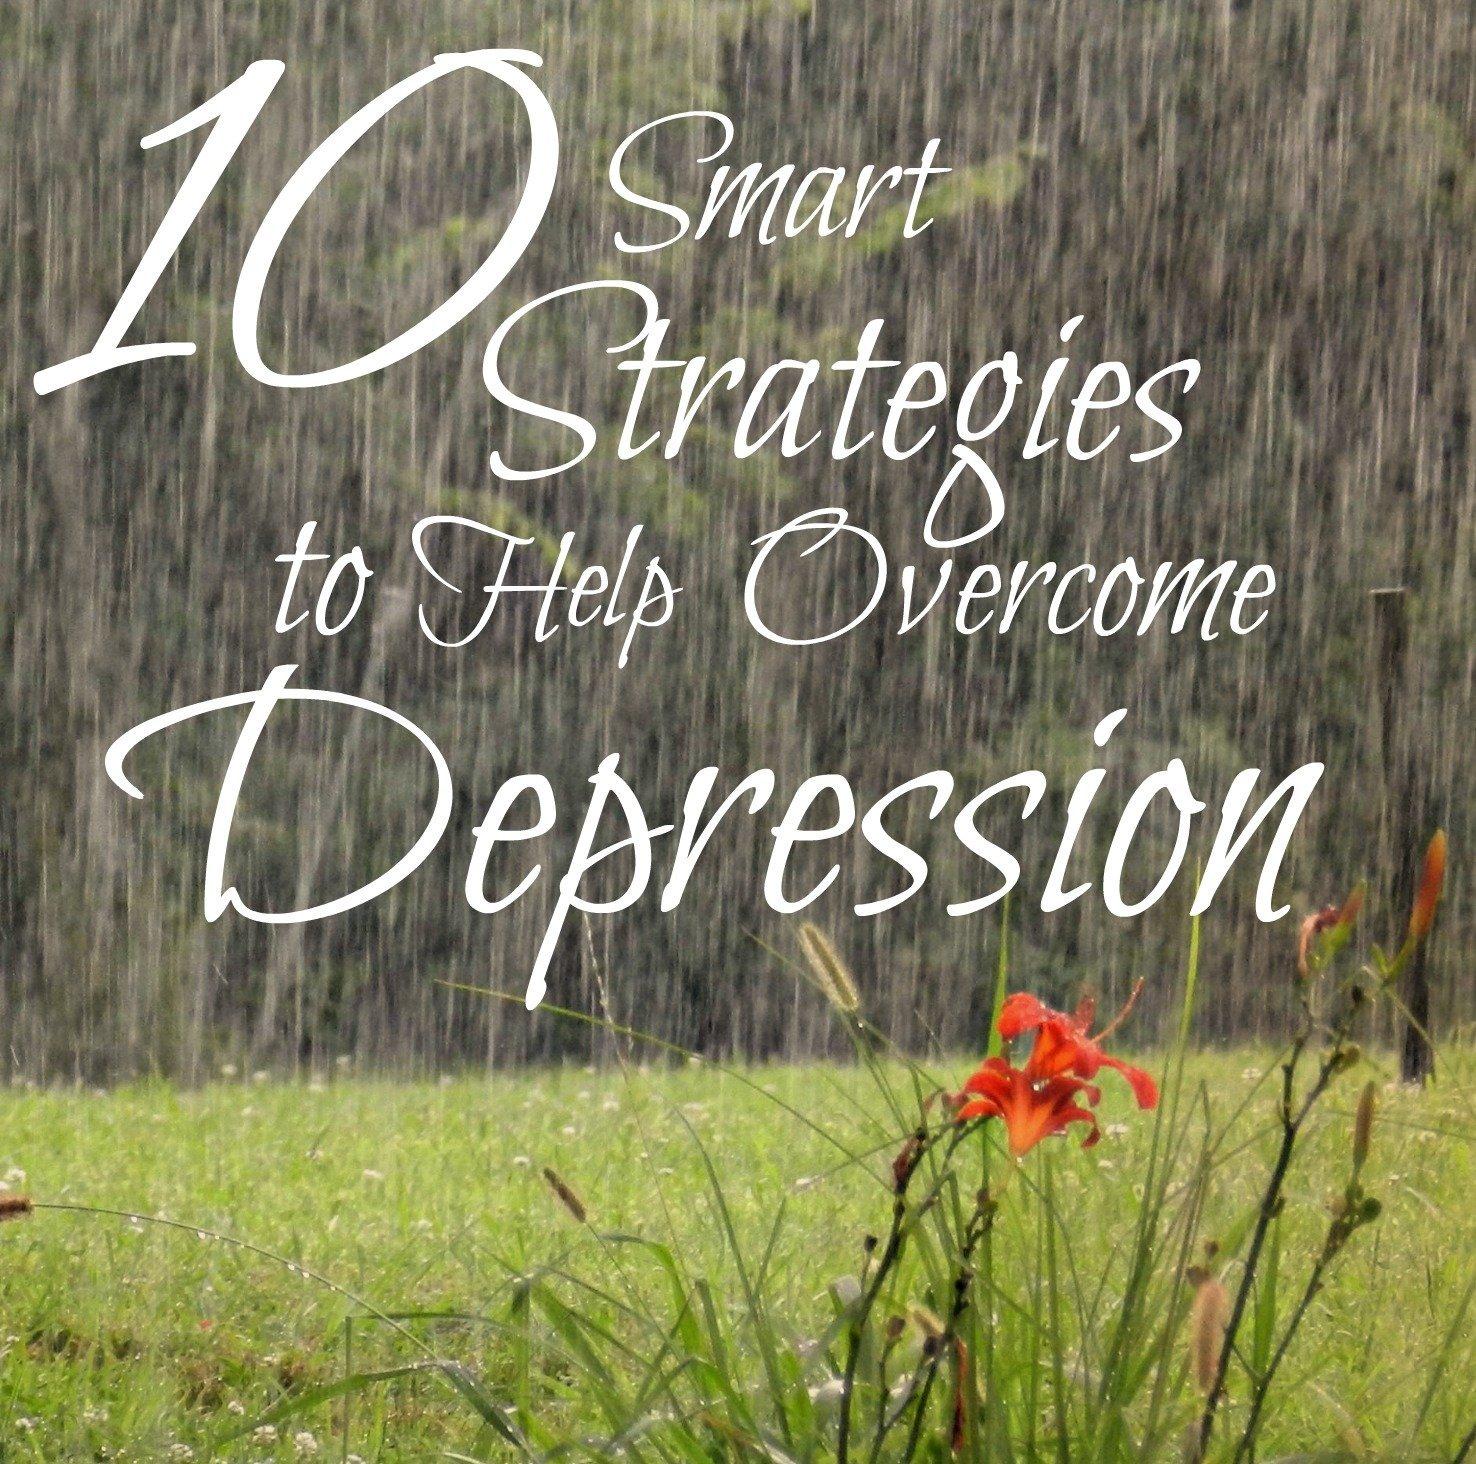 10 Smart Strategies to Overcome Depression